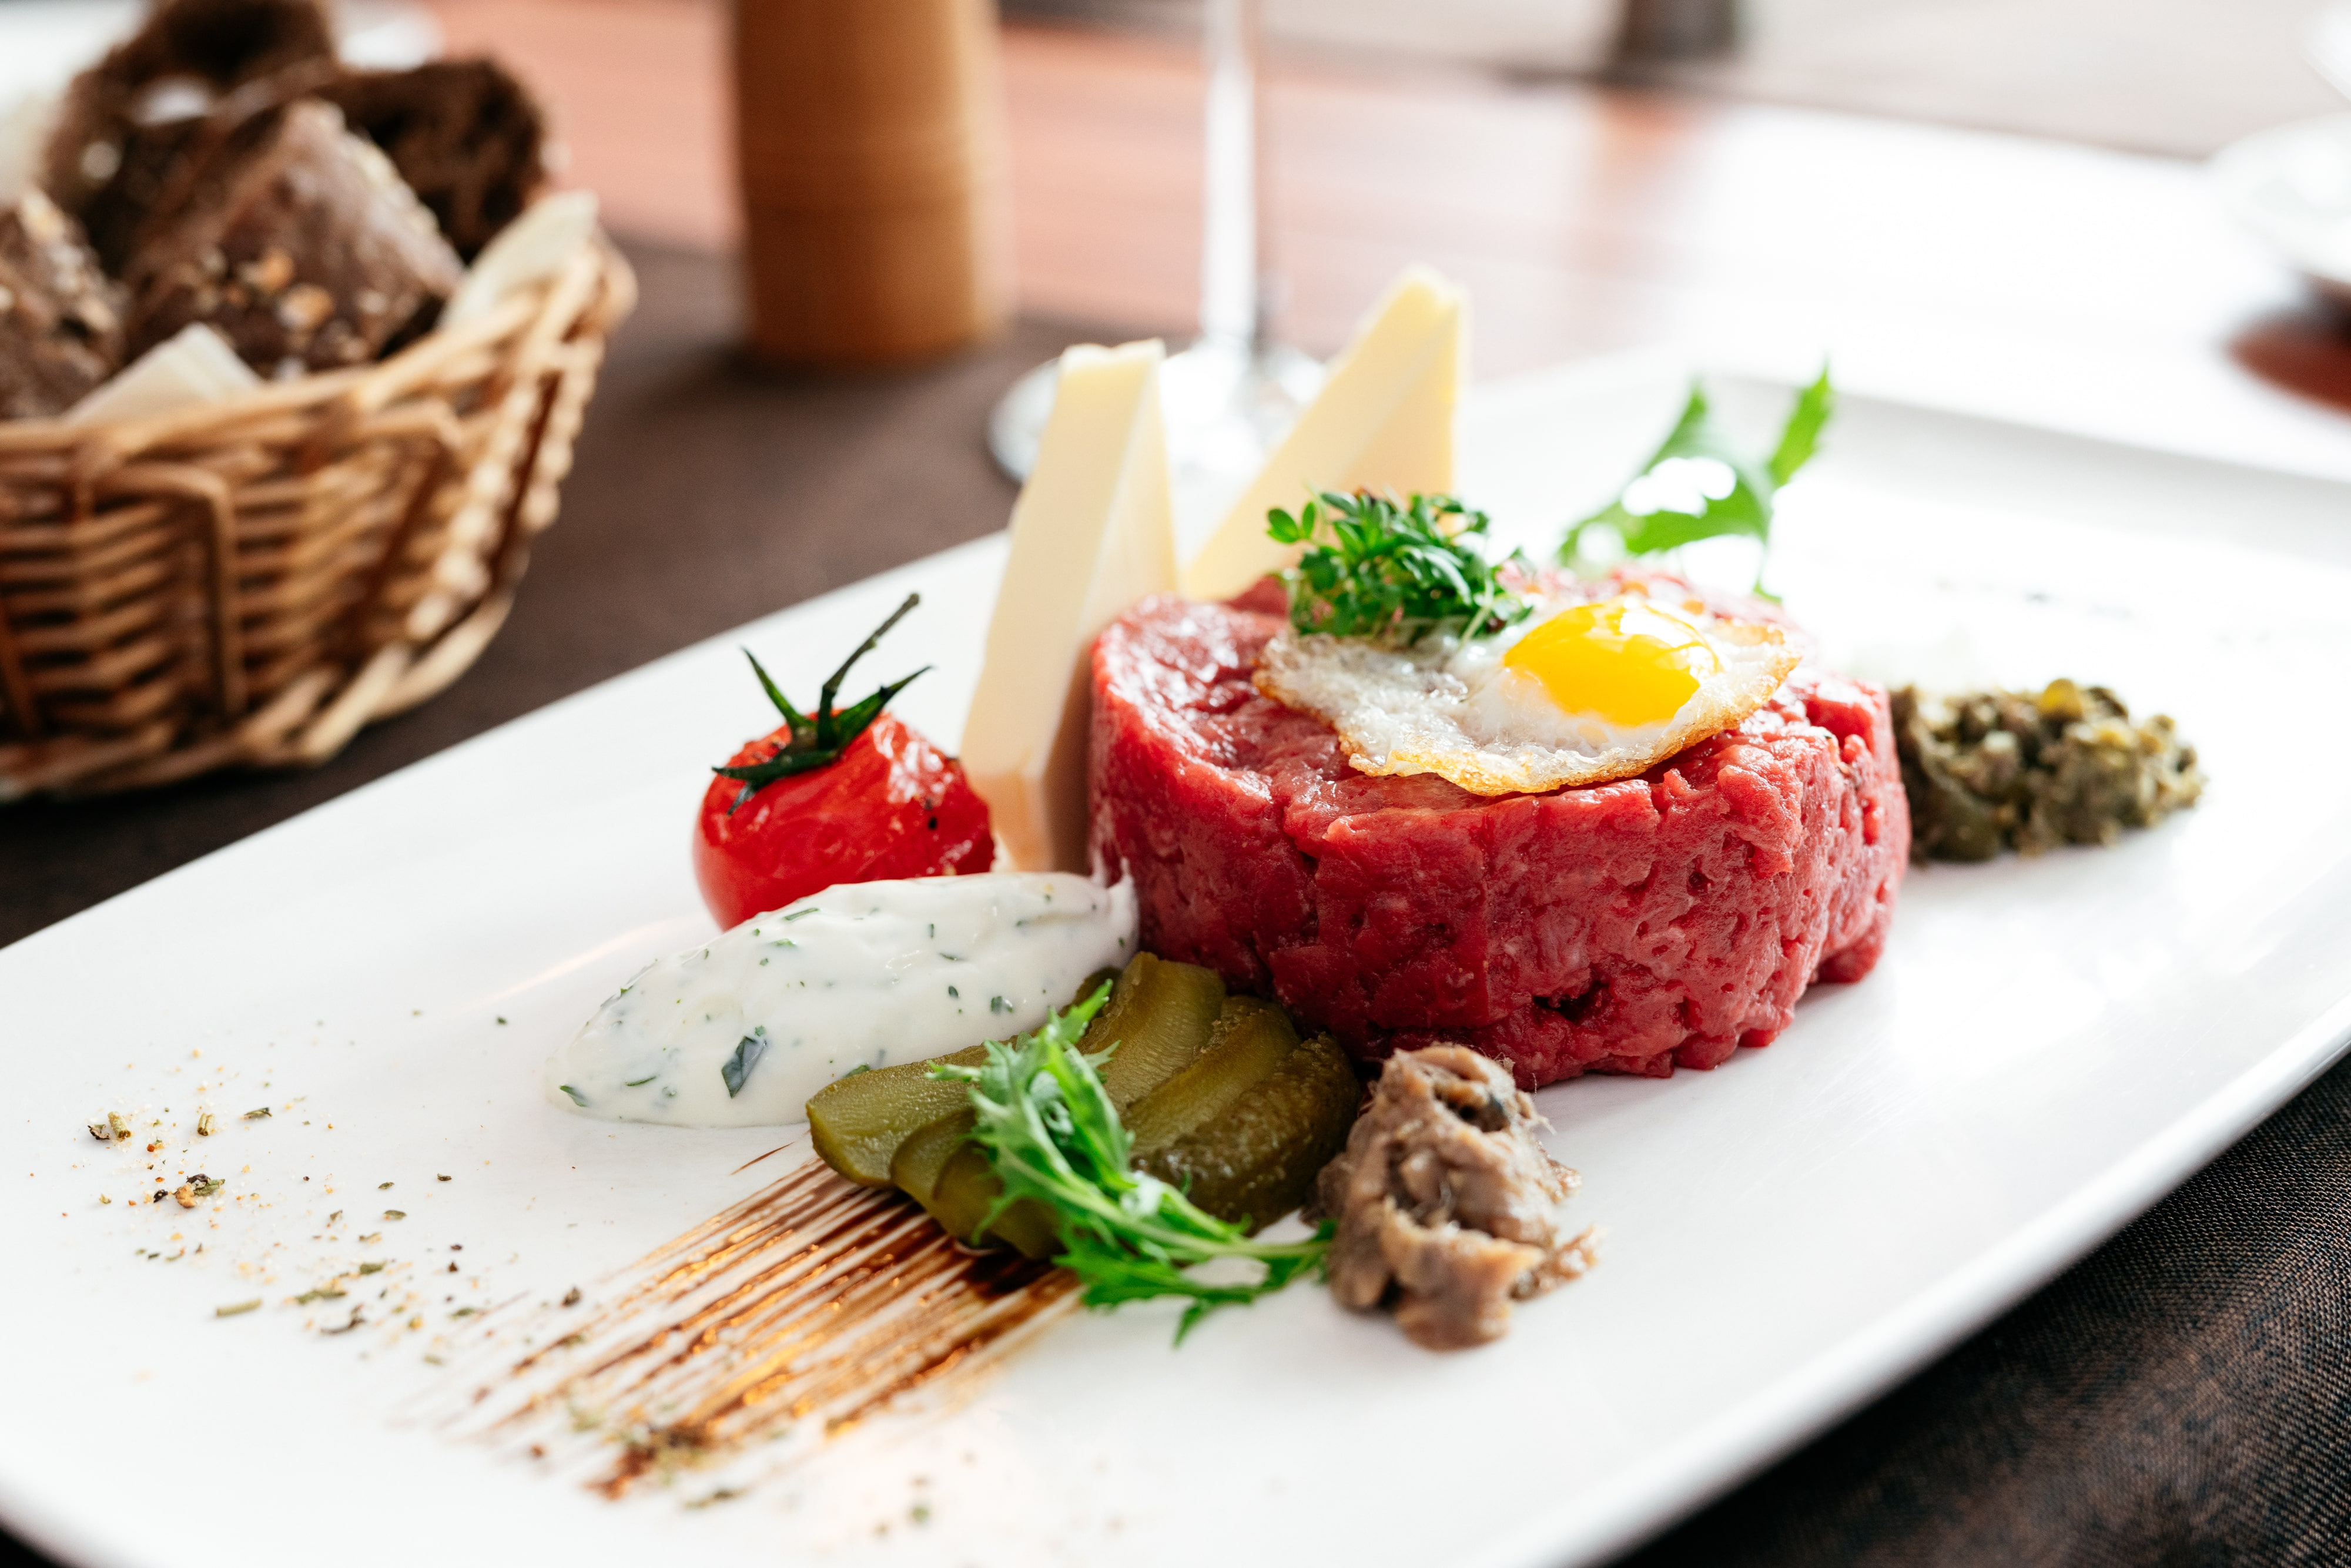 Spizz Restaurant - Cafe & Bar in 01309, Dresden